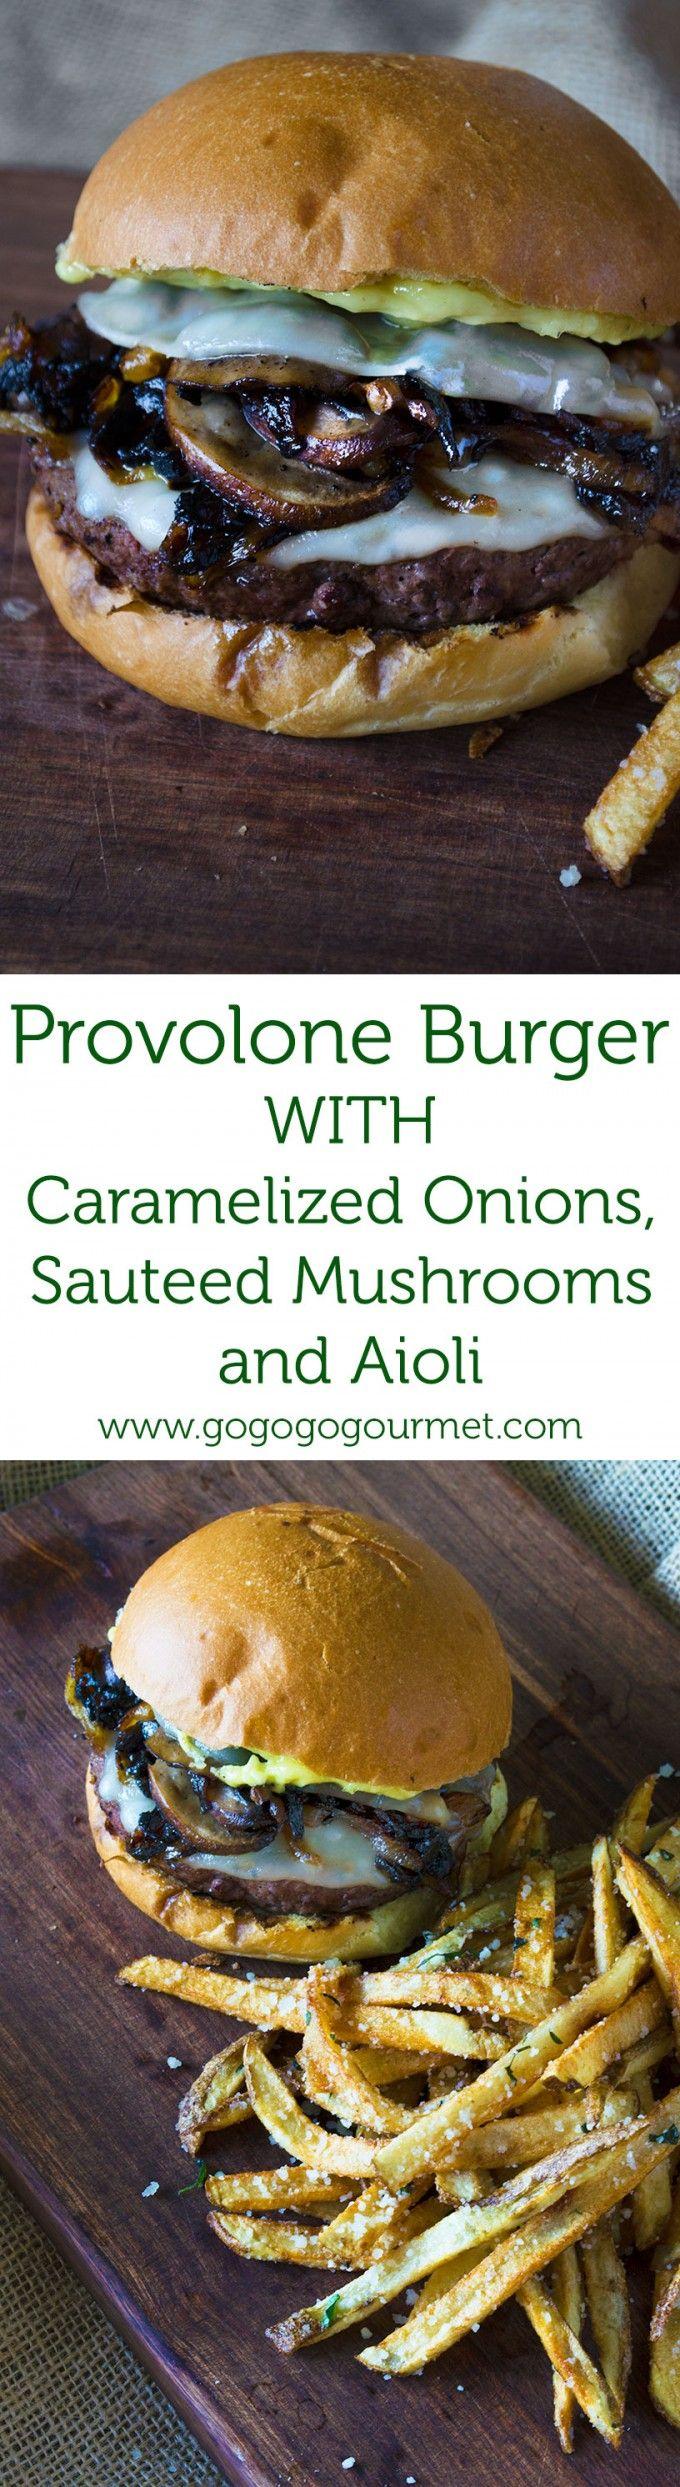 Mushroom Burger with Provolone, Caramelized Onions and Aioli via @gogogogourmet